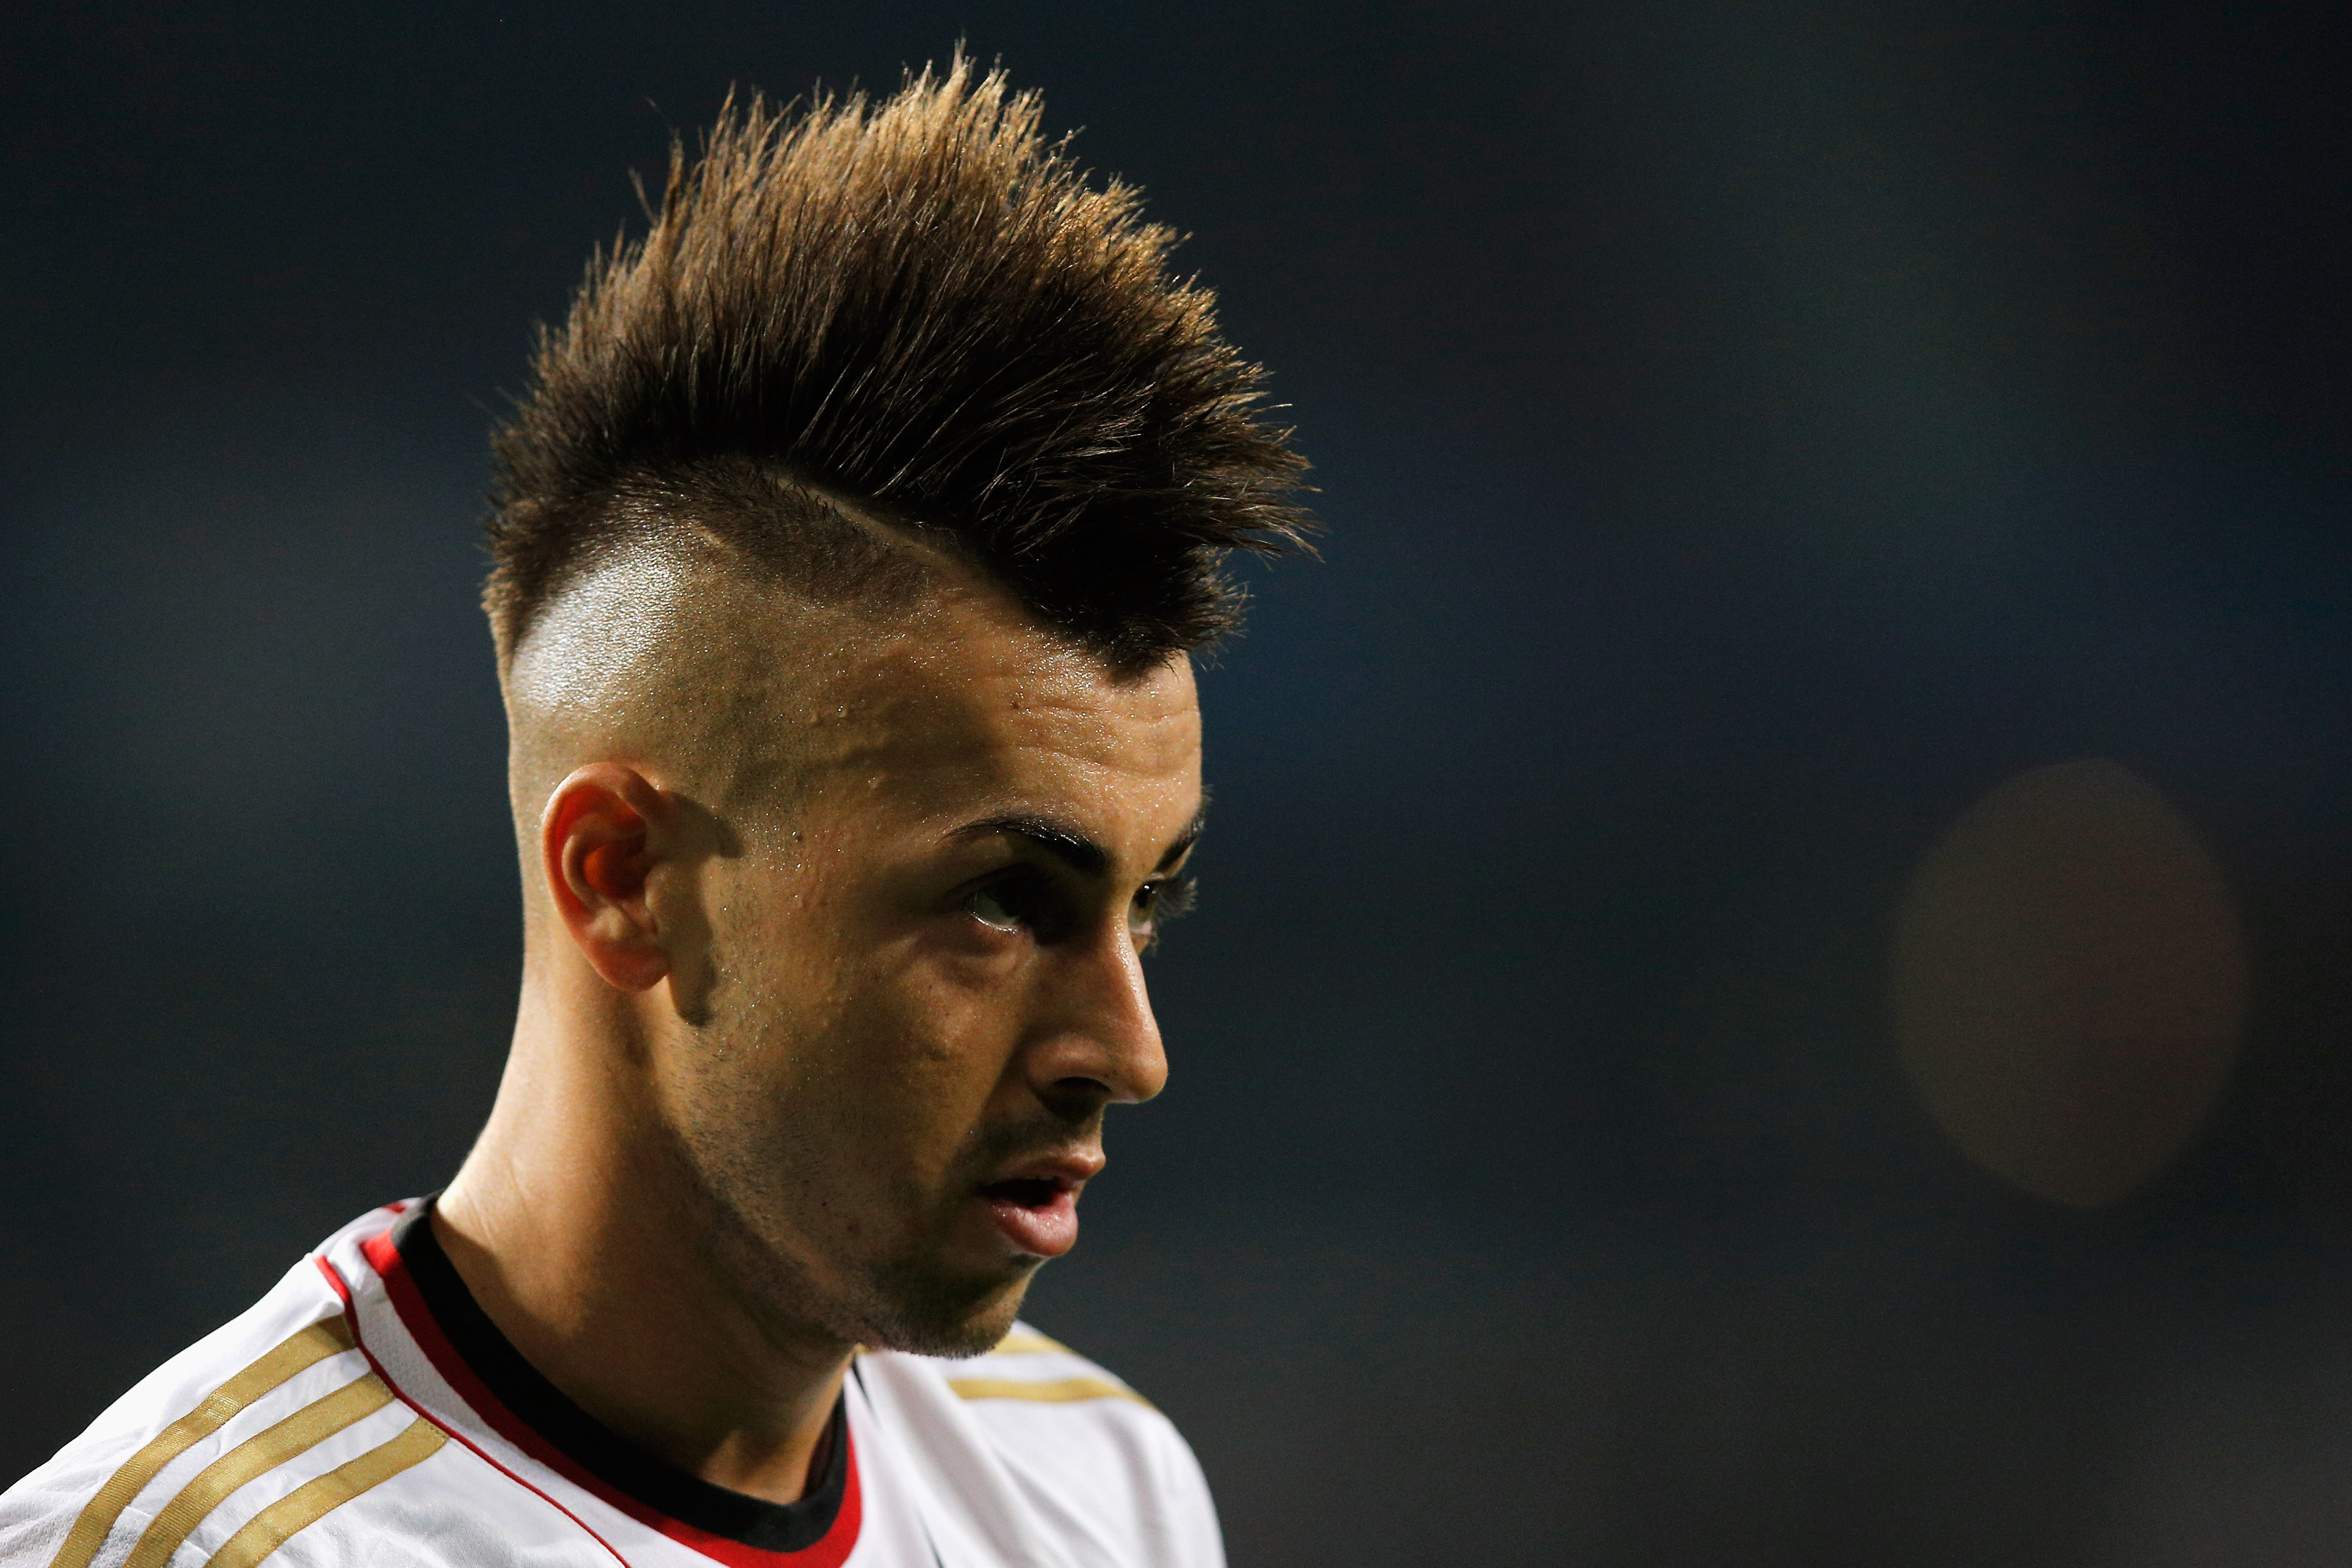 Bad Football Haircut Quiz Playbuzz